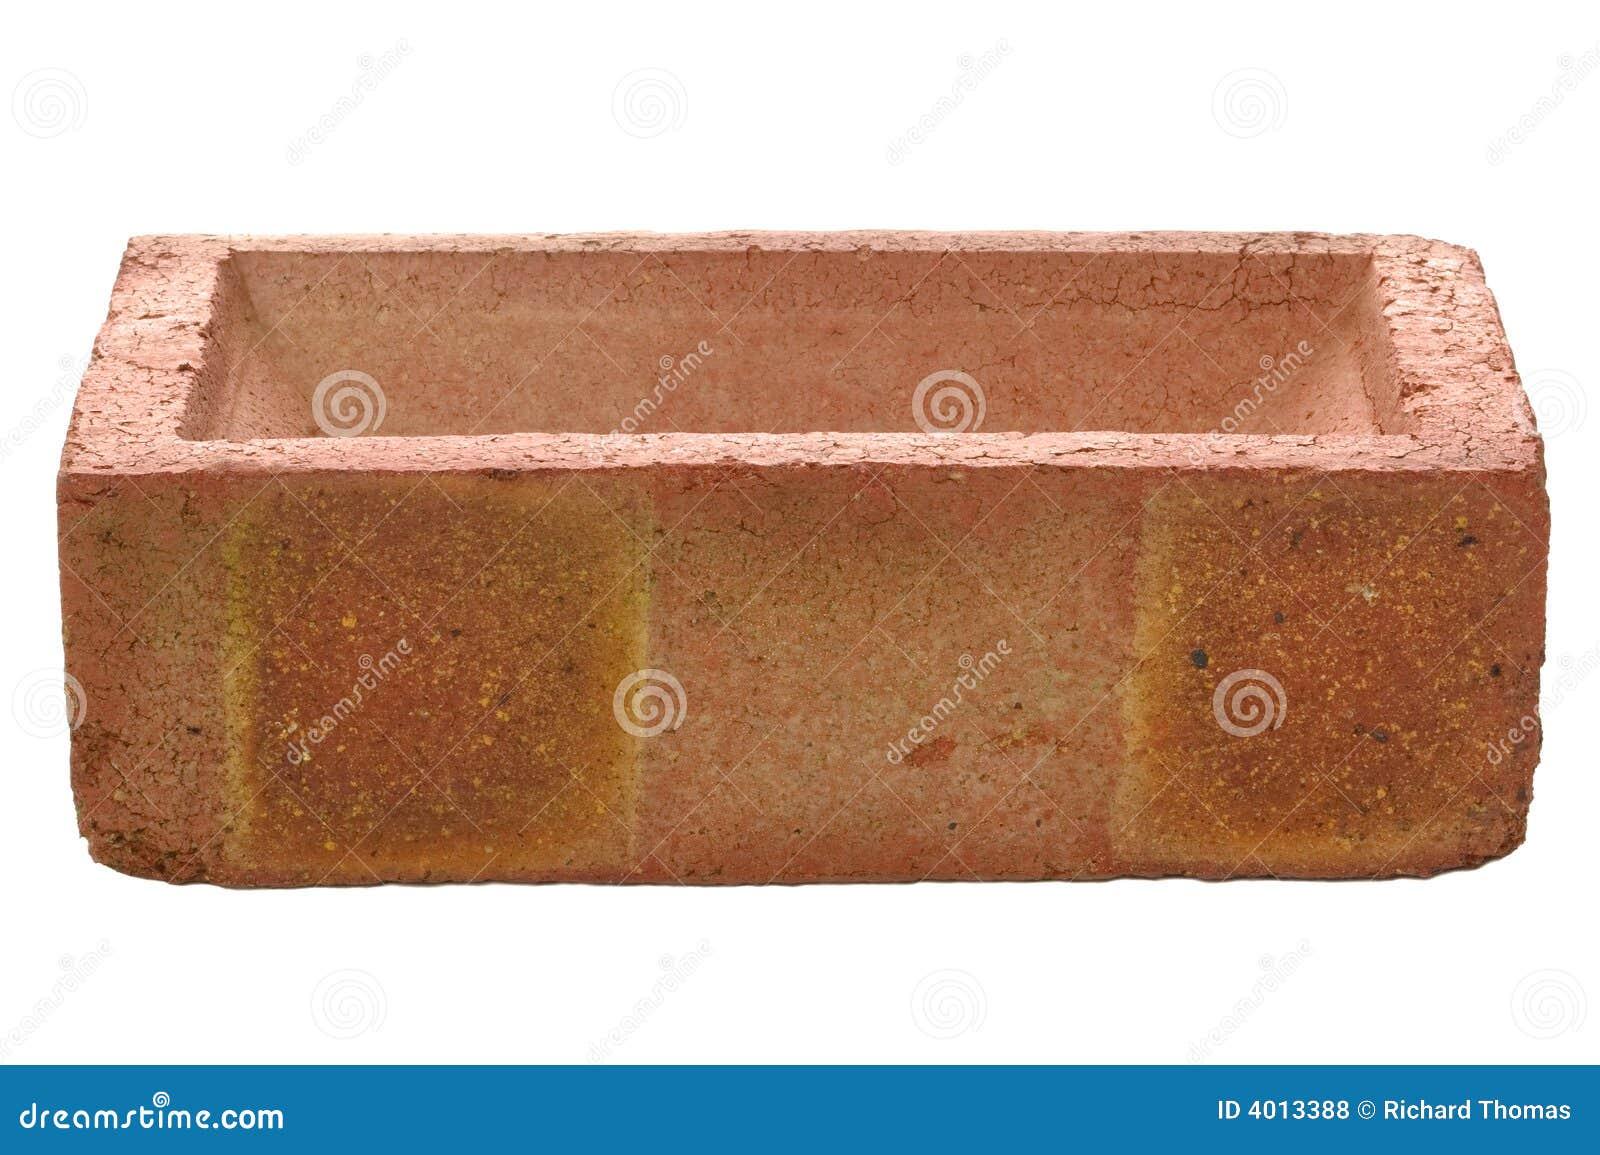 Red brick side